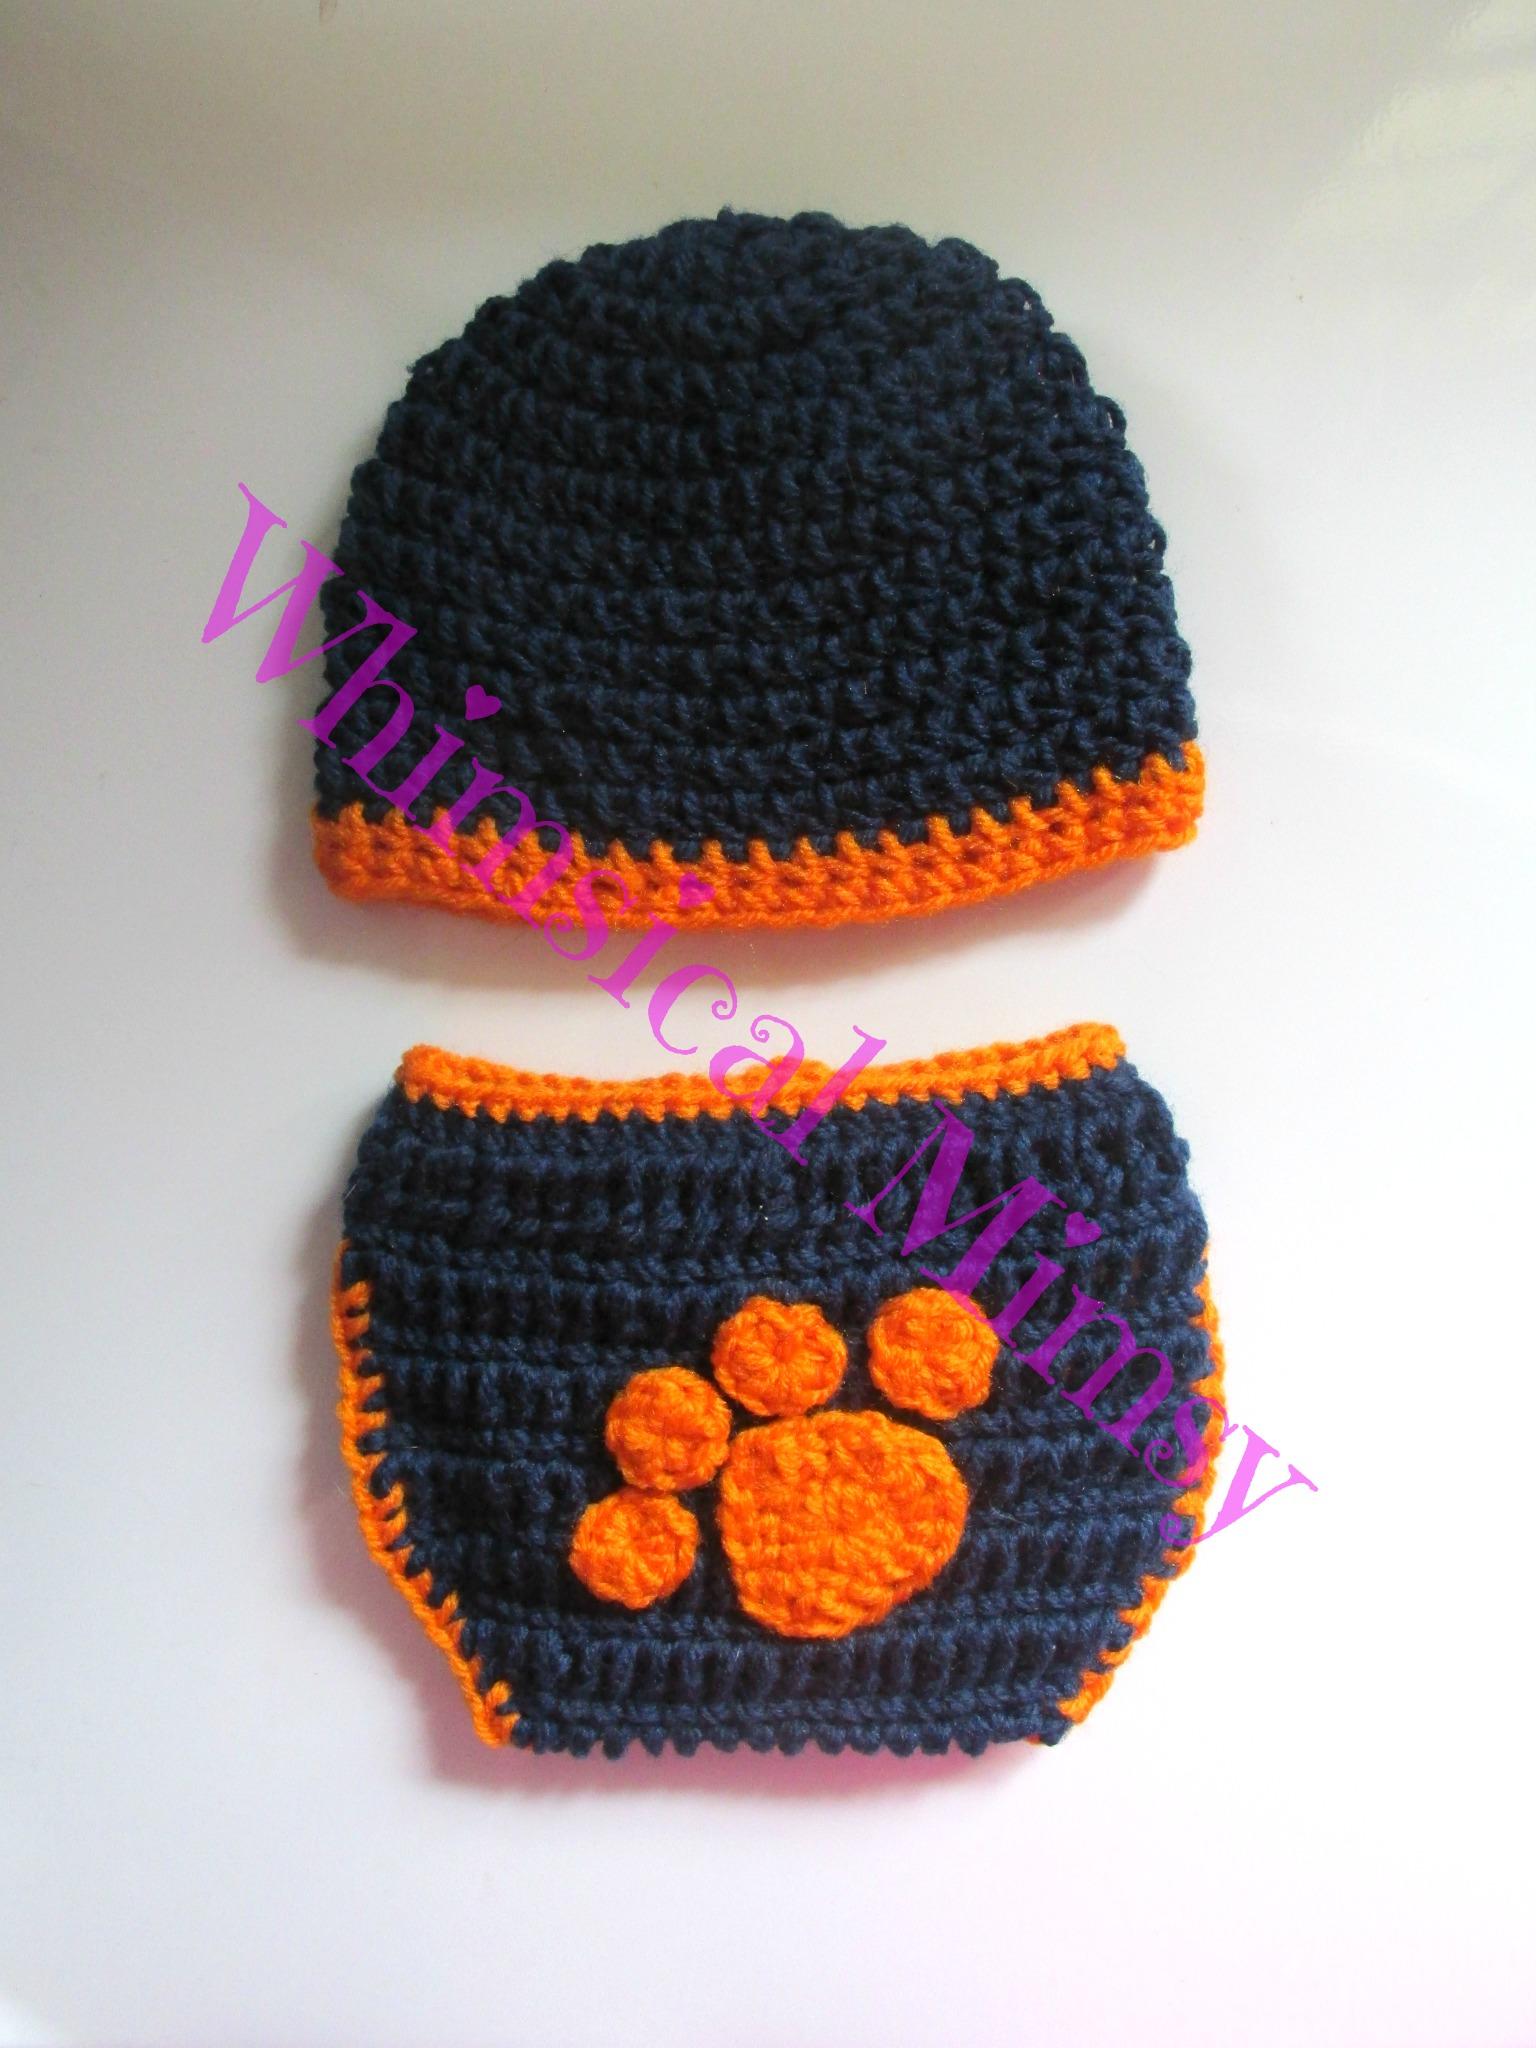 24a8c4de3b9 Crochet Auburn Football Inspired Newborn Hat and Diaper Cover Set Photo Prop  - Thumbnail 1 ...